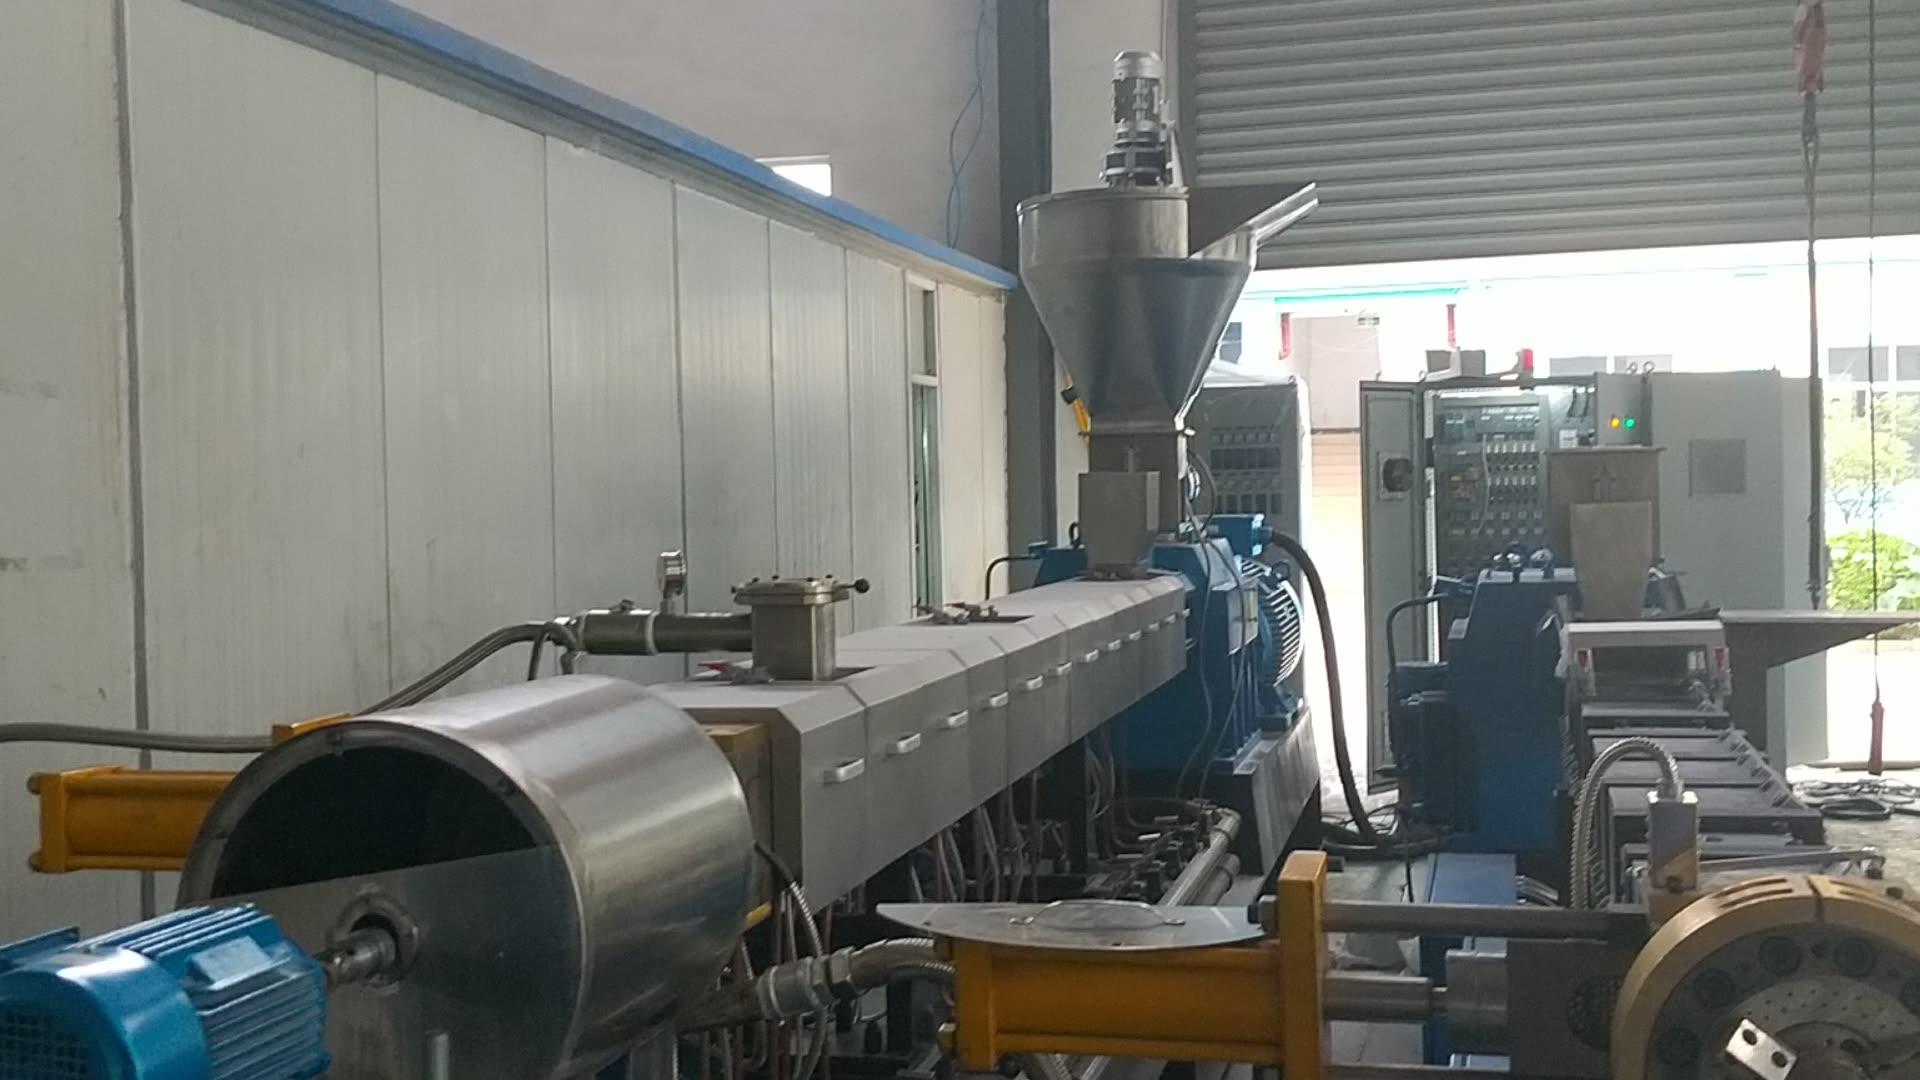 Nanjing HS TSE-75B двухшнековые экструдеры для маточная сажи